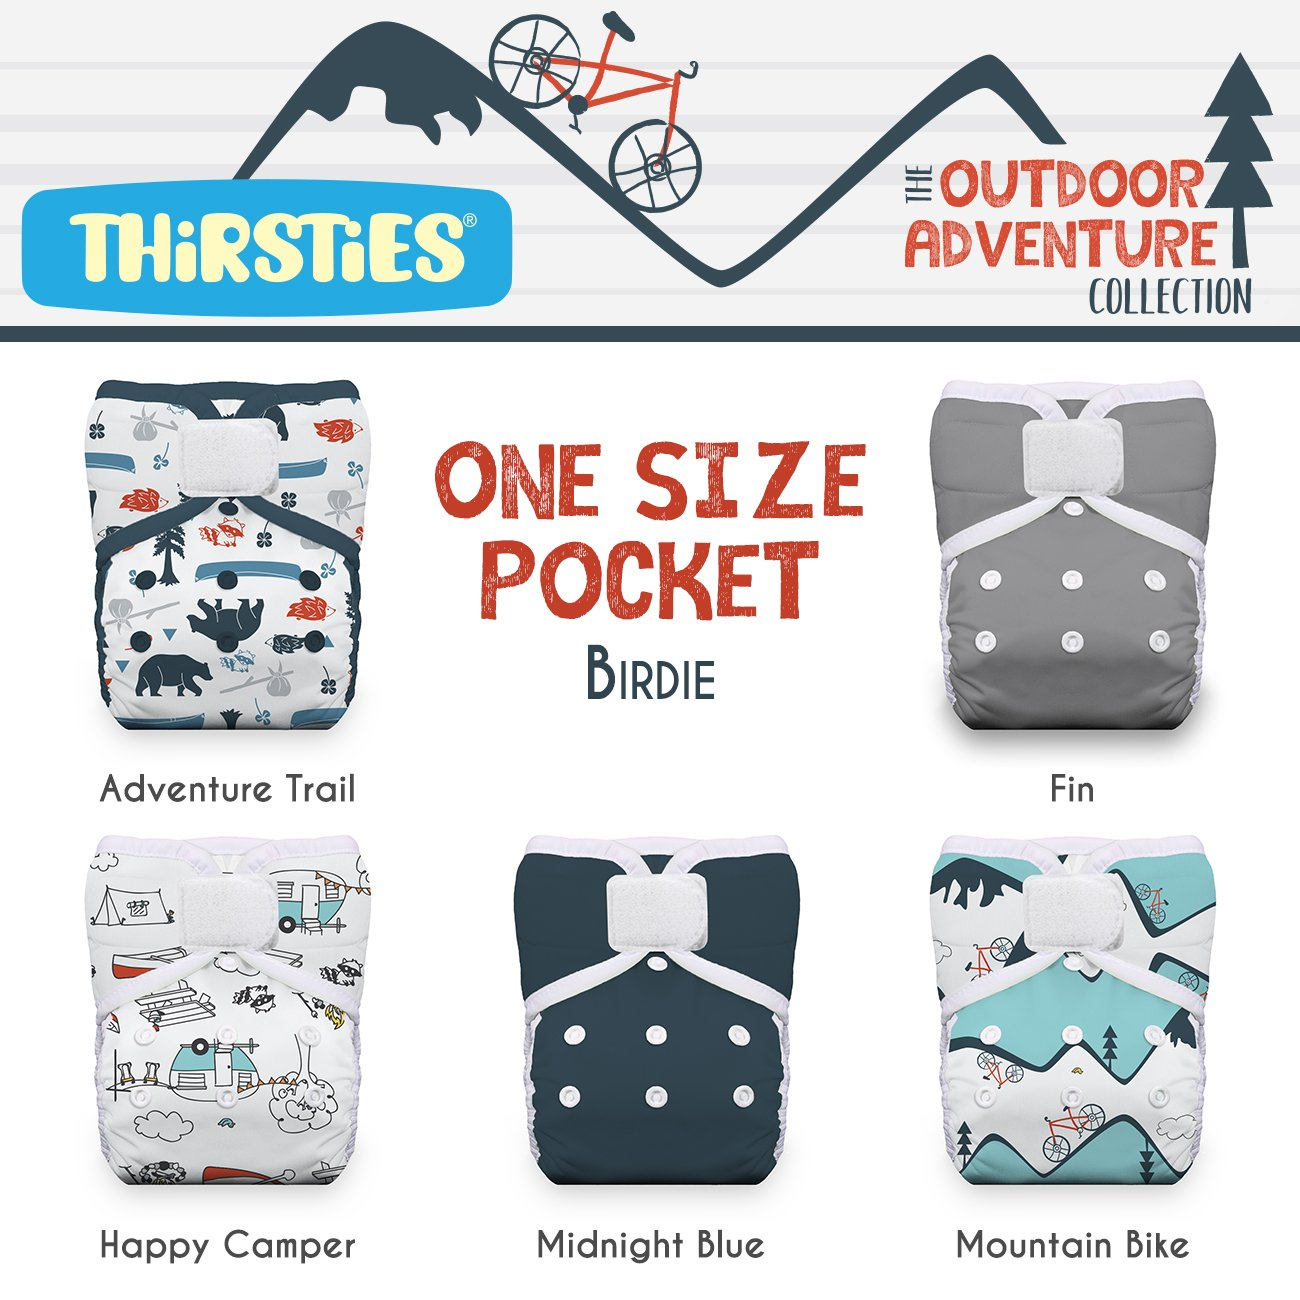 Thirsties Package, One Size Pocket Diaper Hook & Loop, Outdoor Adventure Collection Birdie